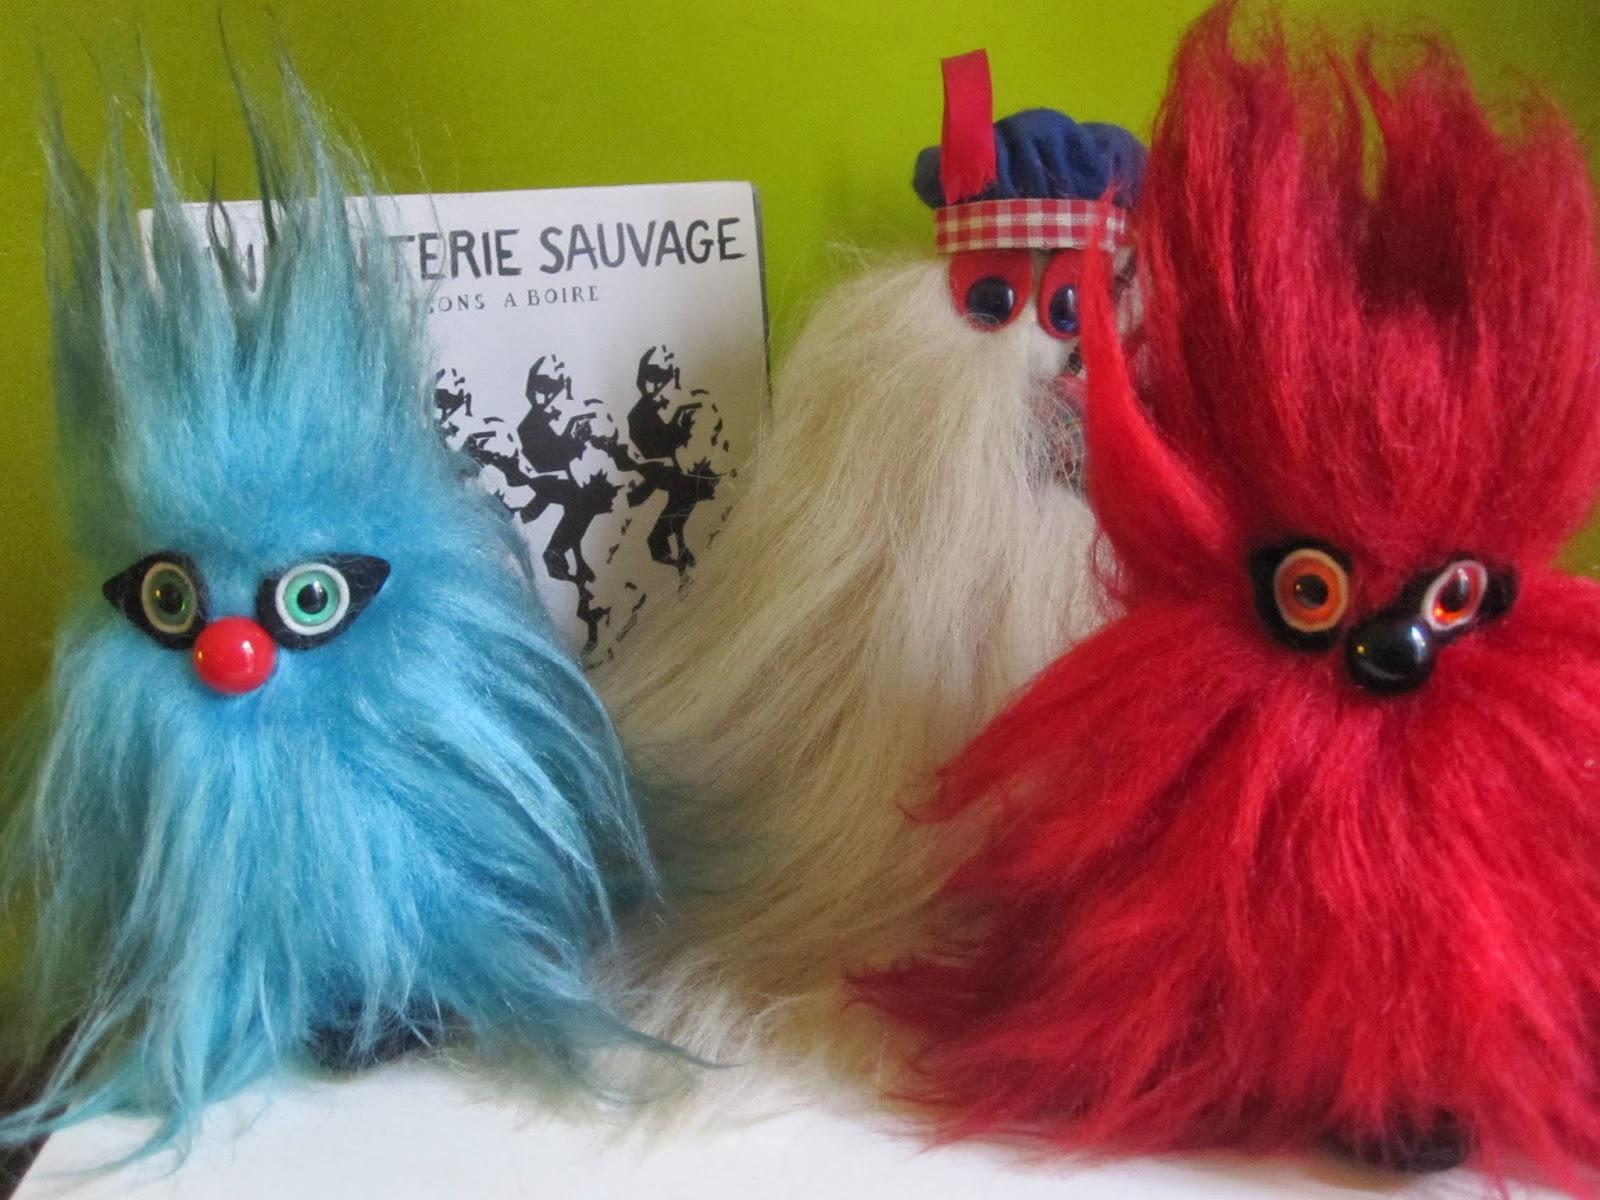 http://crazeegirlsound.blogspot.fr/2014/02/linfanterie-sauvage-nuits-blanches-1984.html